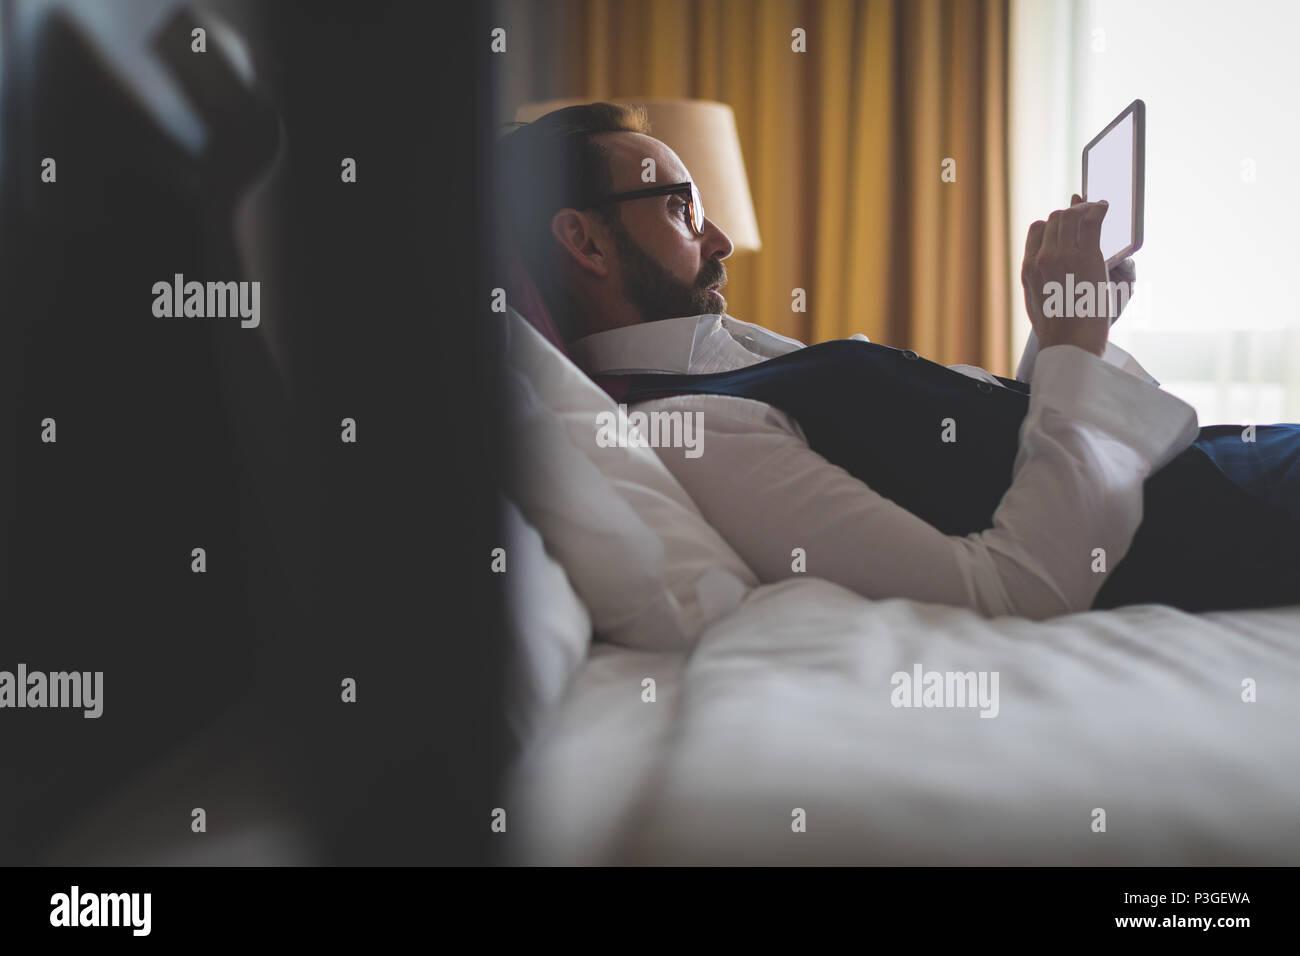 Businessman using digital tablet in bedroom - Stock Image